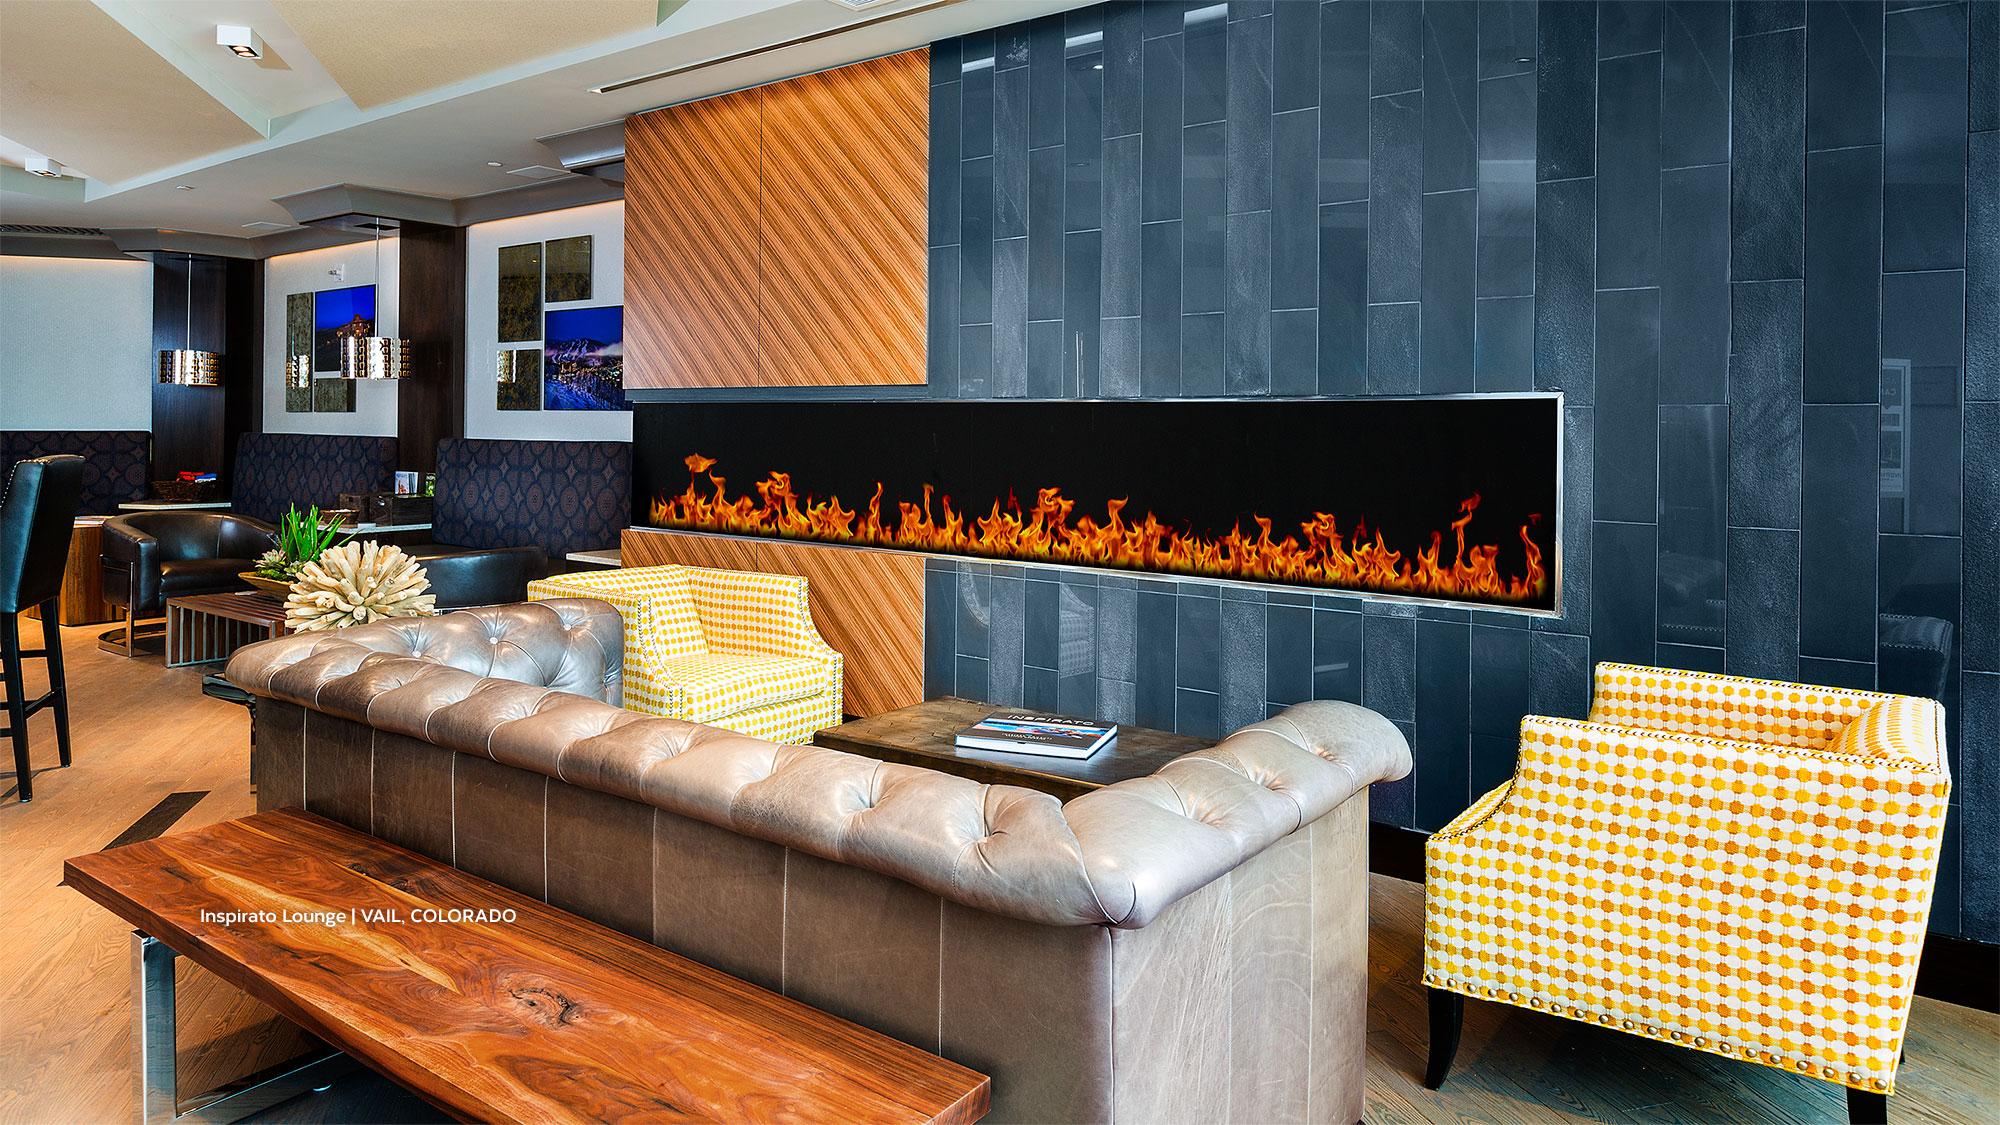 Inspirato lounge